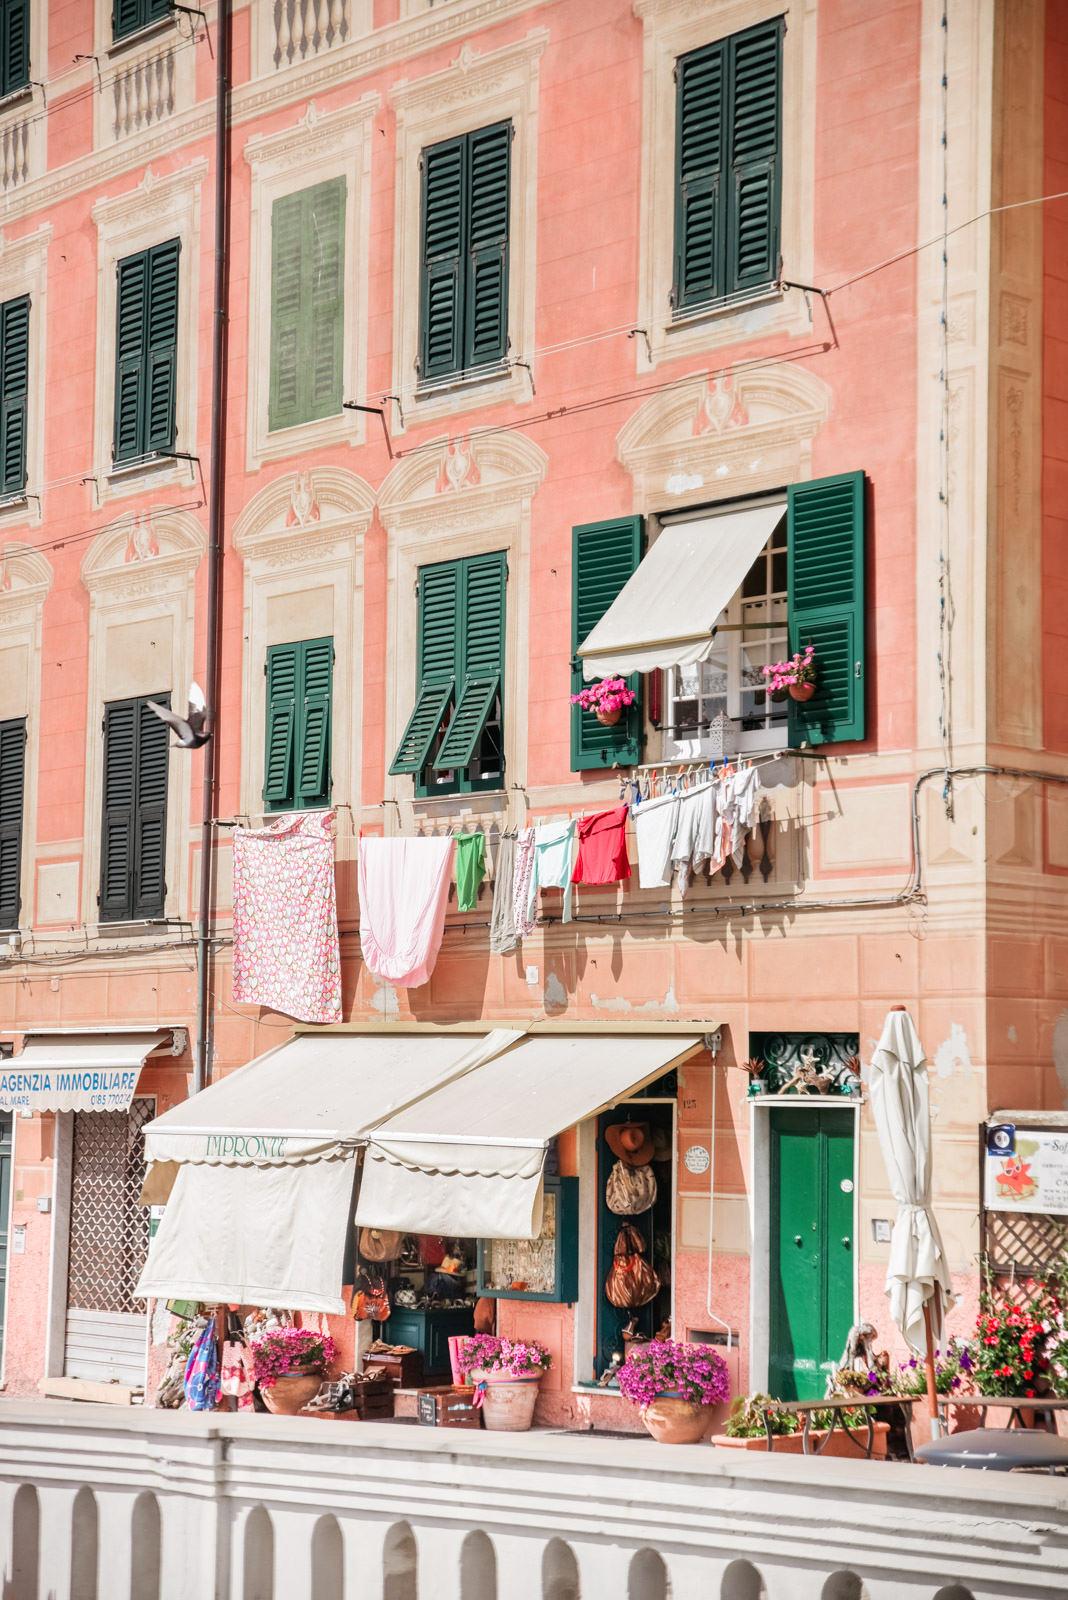 Blog-Mode-And-The-City-Lifestyle-Italie-Bocadasse-Camogli-Sestri-Levante-18